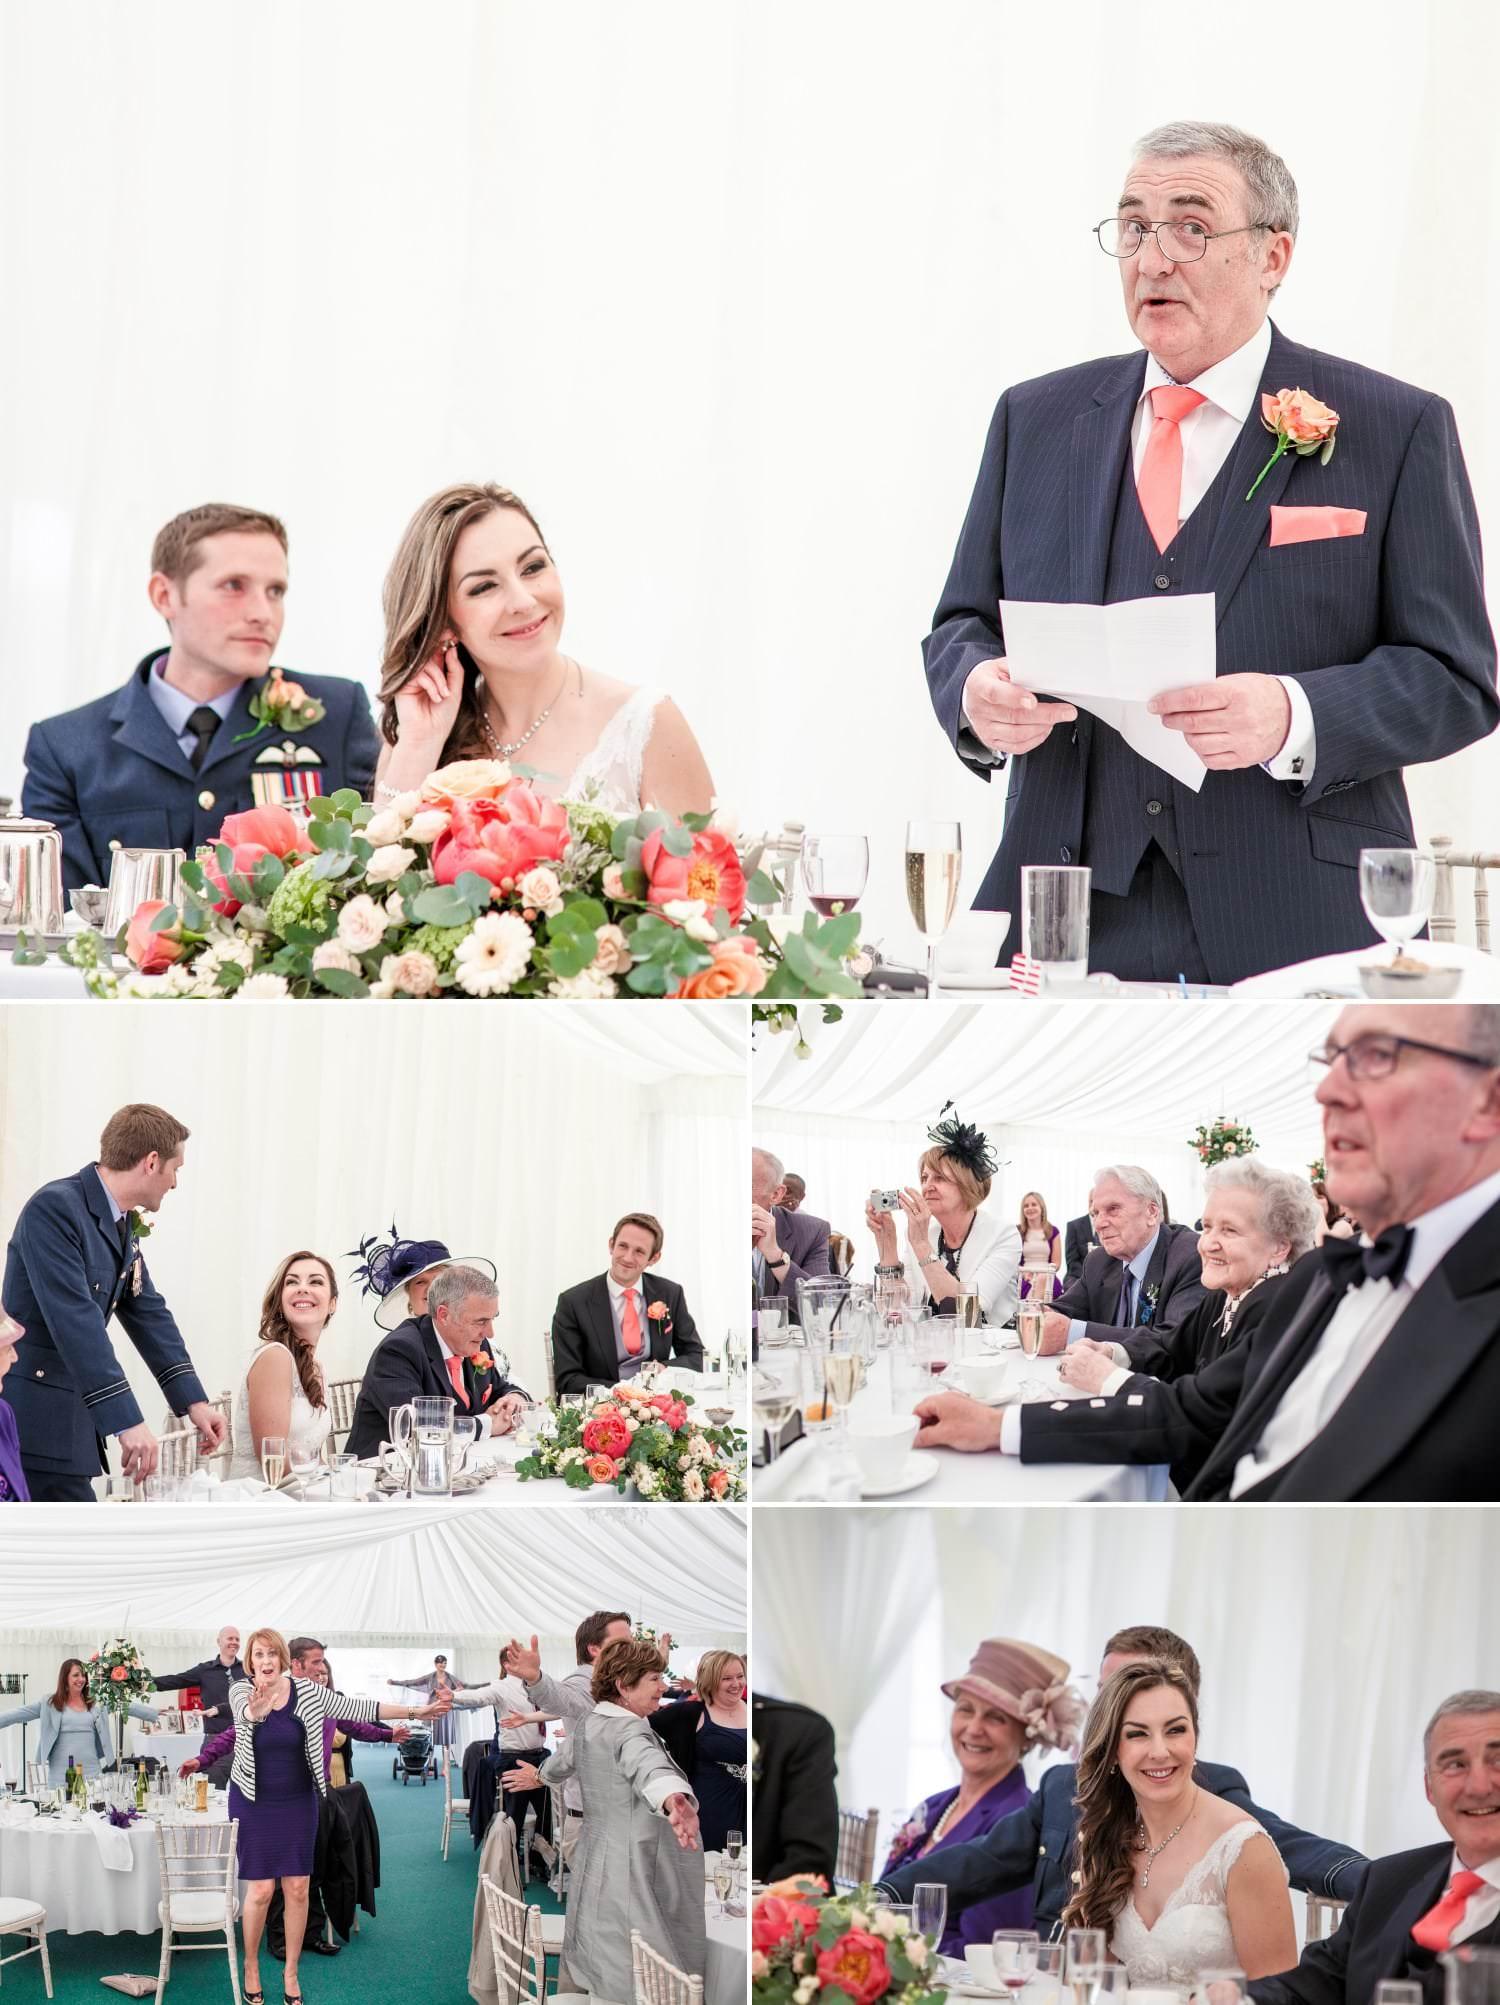 Weding Photography speeches at Netley Hall, Shropshire